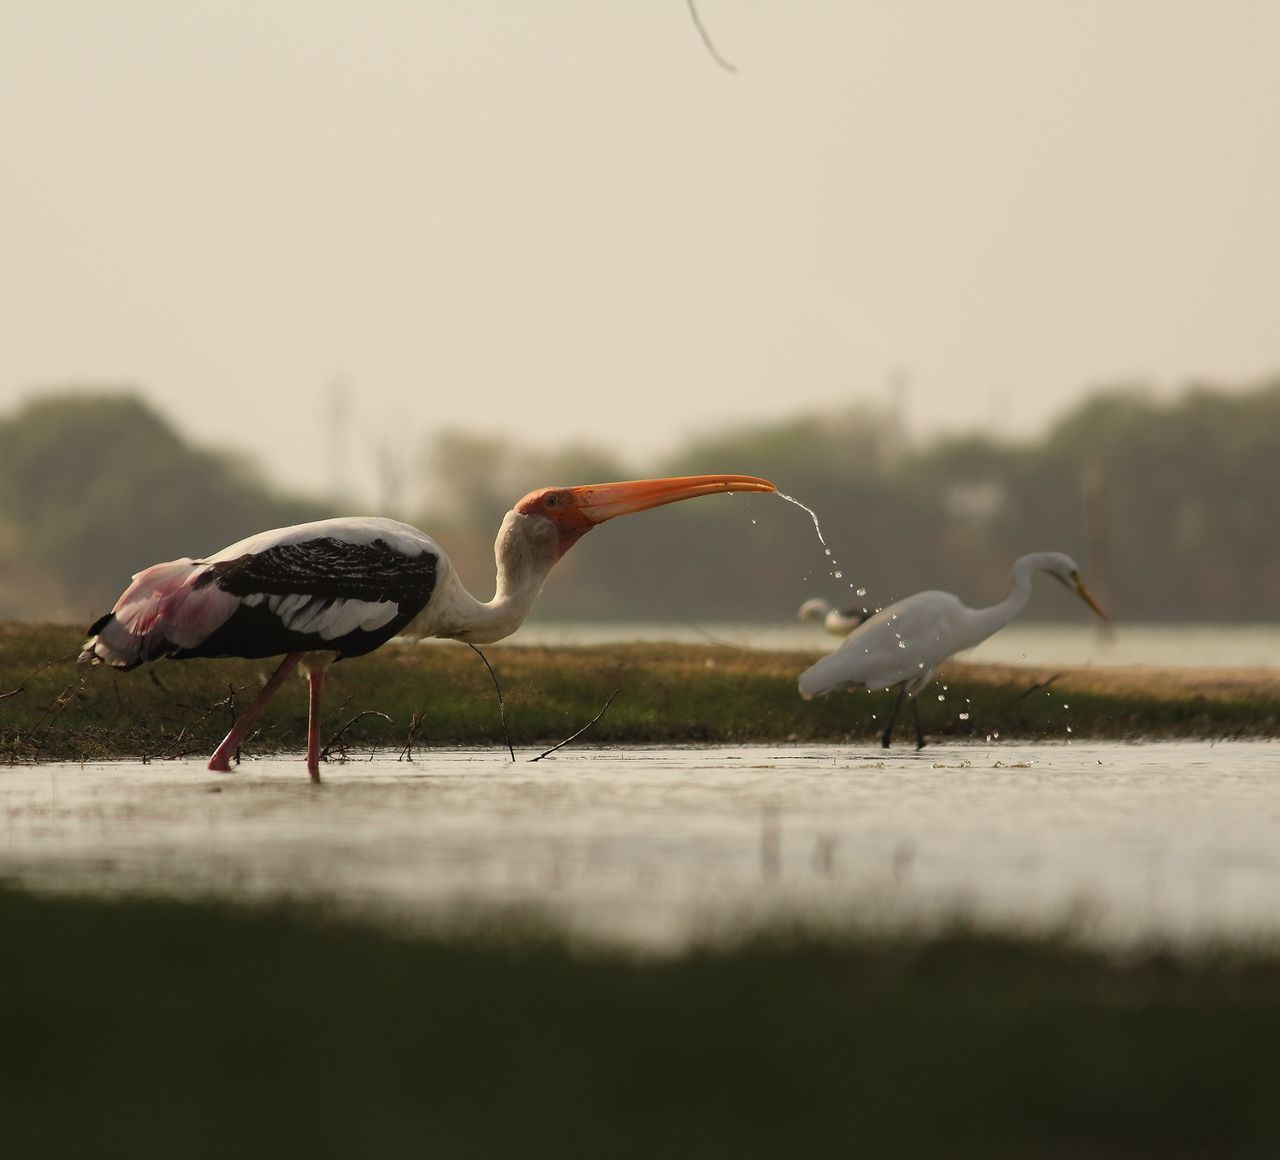 bird, animals in the wild, animal themes, animal wildlife, nature, no people, water, day, outdoors, beauty in nature, crane - bird, flamingo, sky